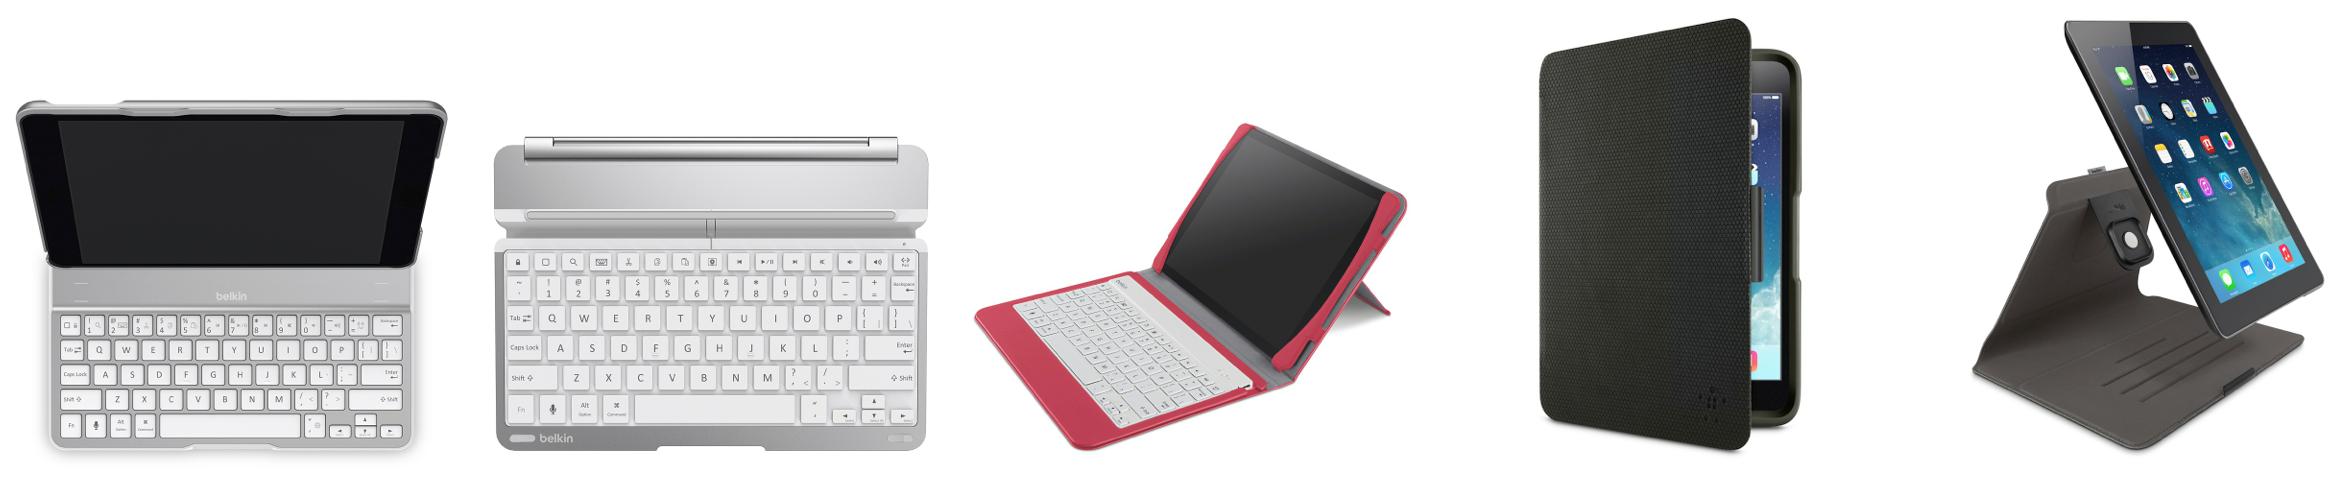 Belkin-iPadAir-iPadMiniRetina-cases